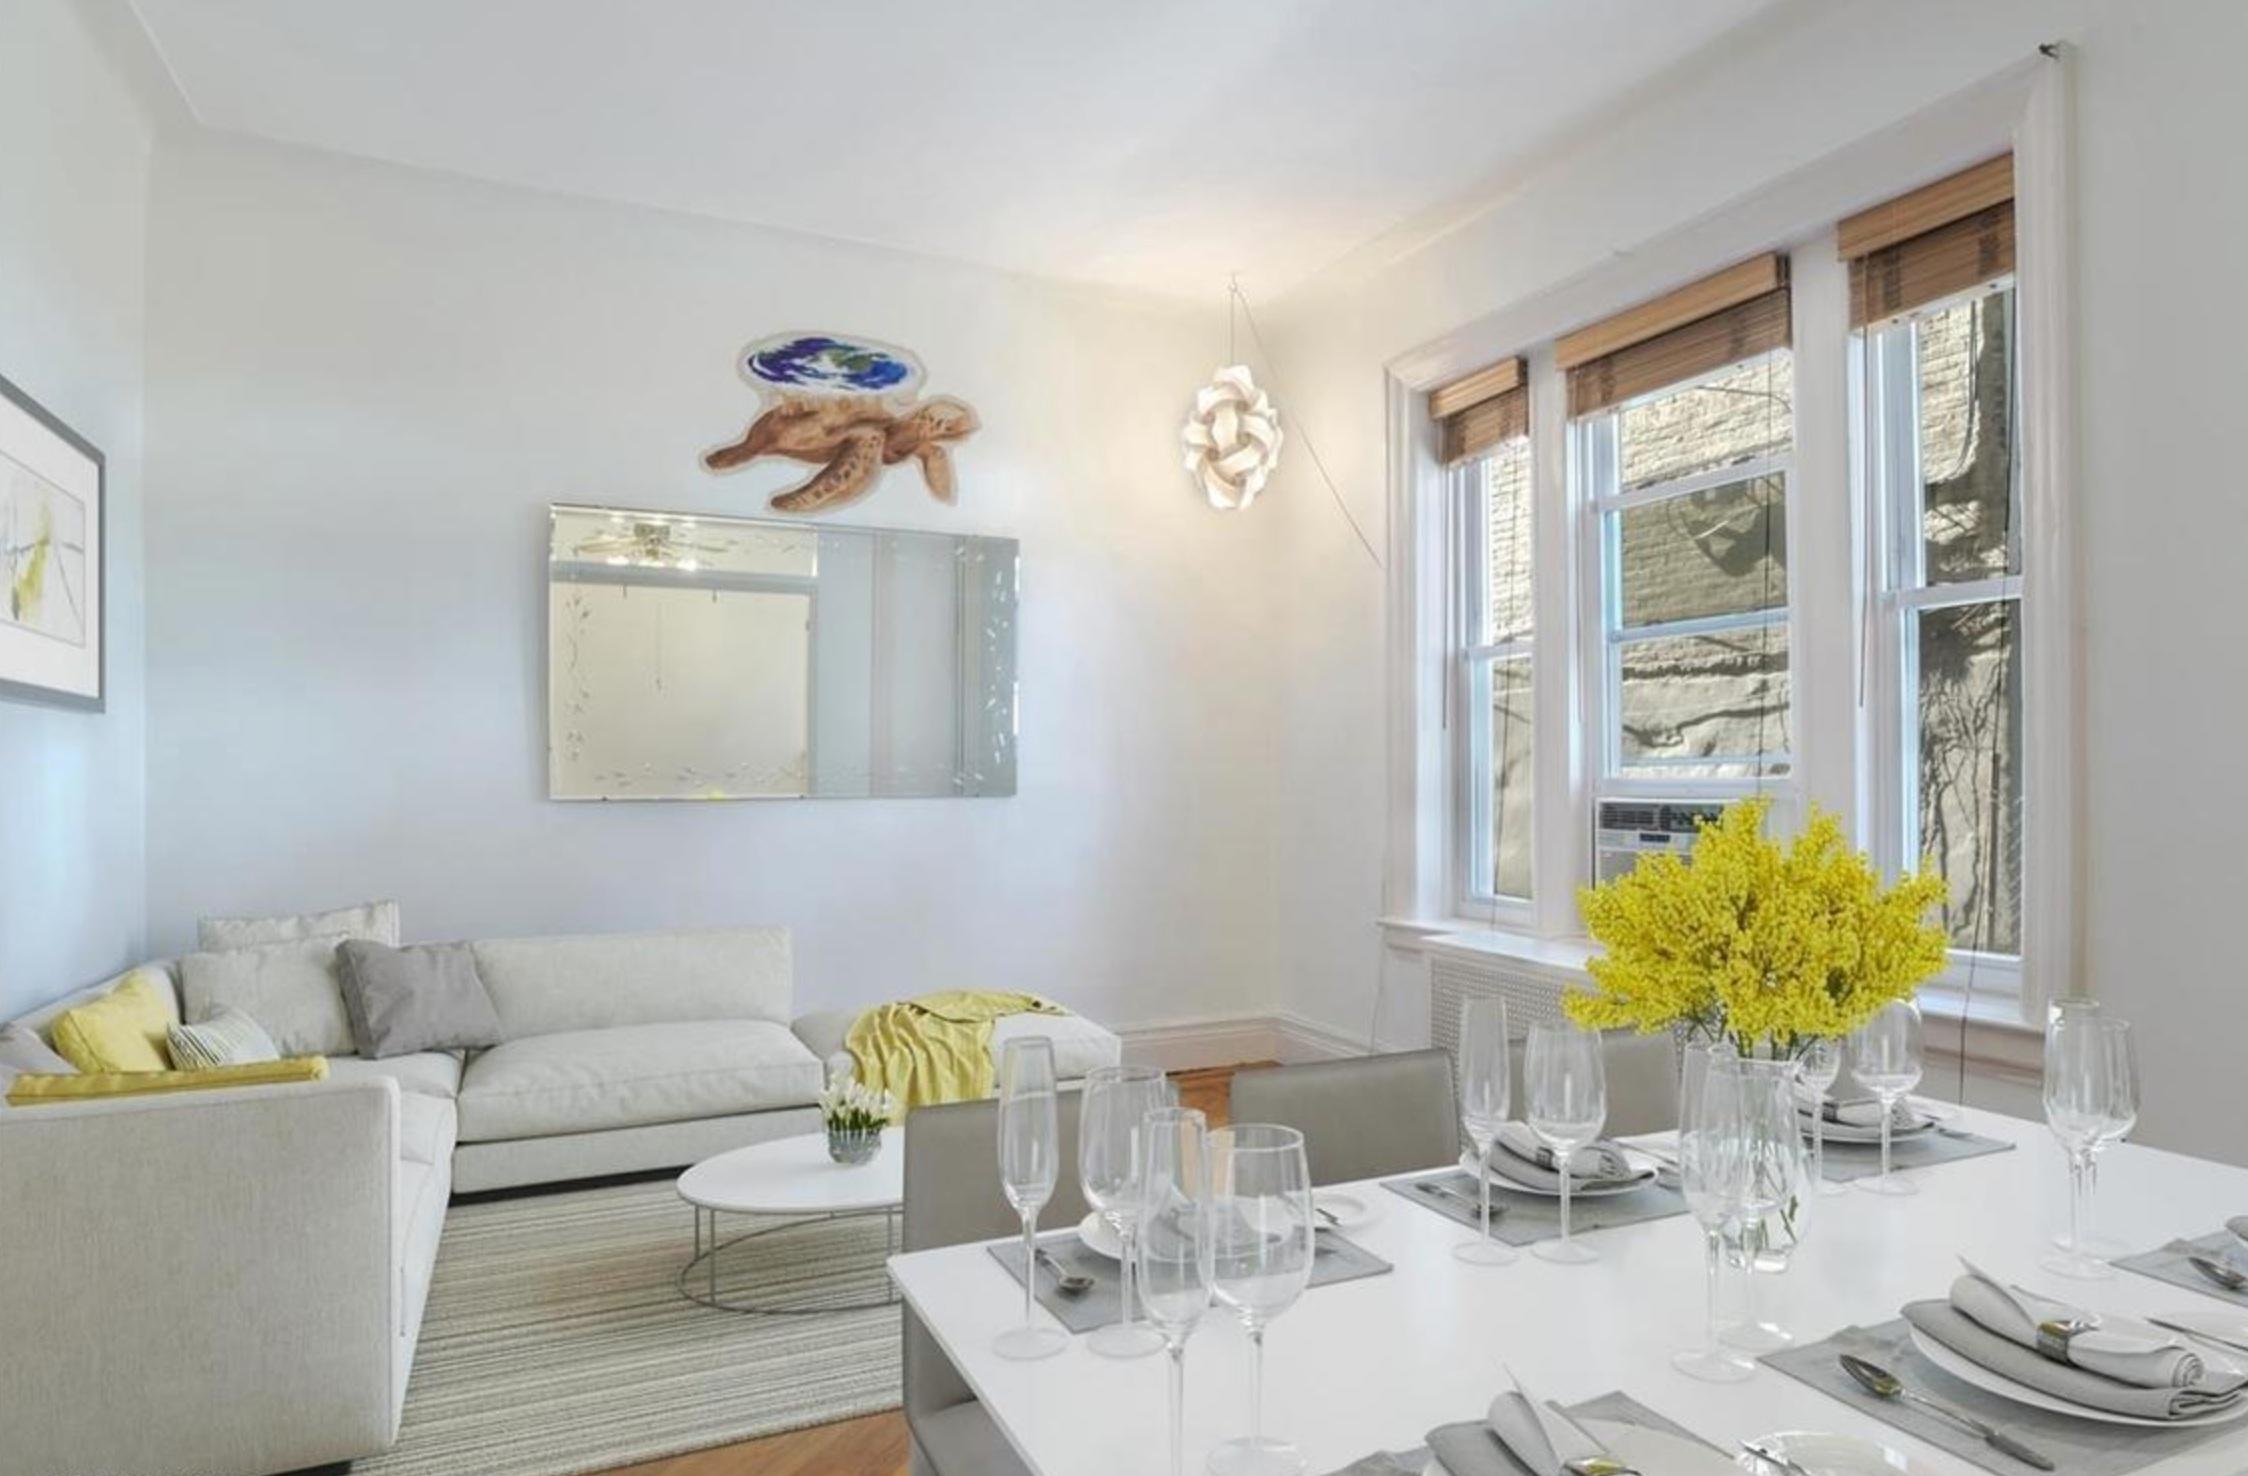 574 44th St, #1B - Sunset Park | Brooklyn    2 Bedroom // 1 Bath Days on Market — 105 Sold Price:    $605,000